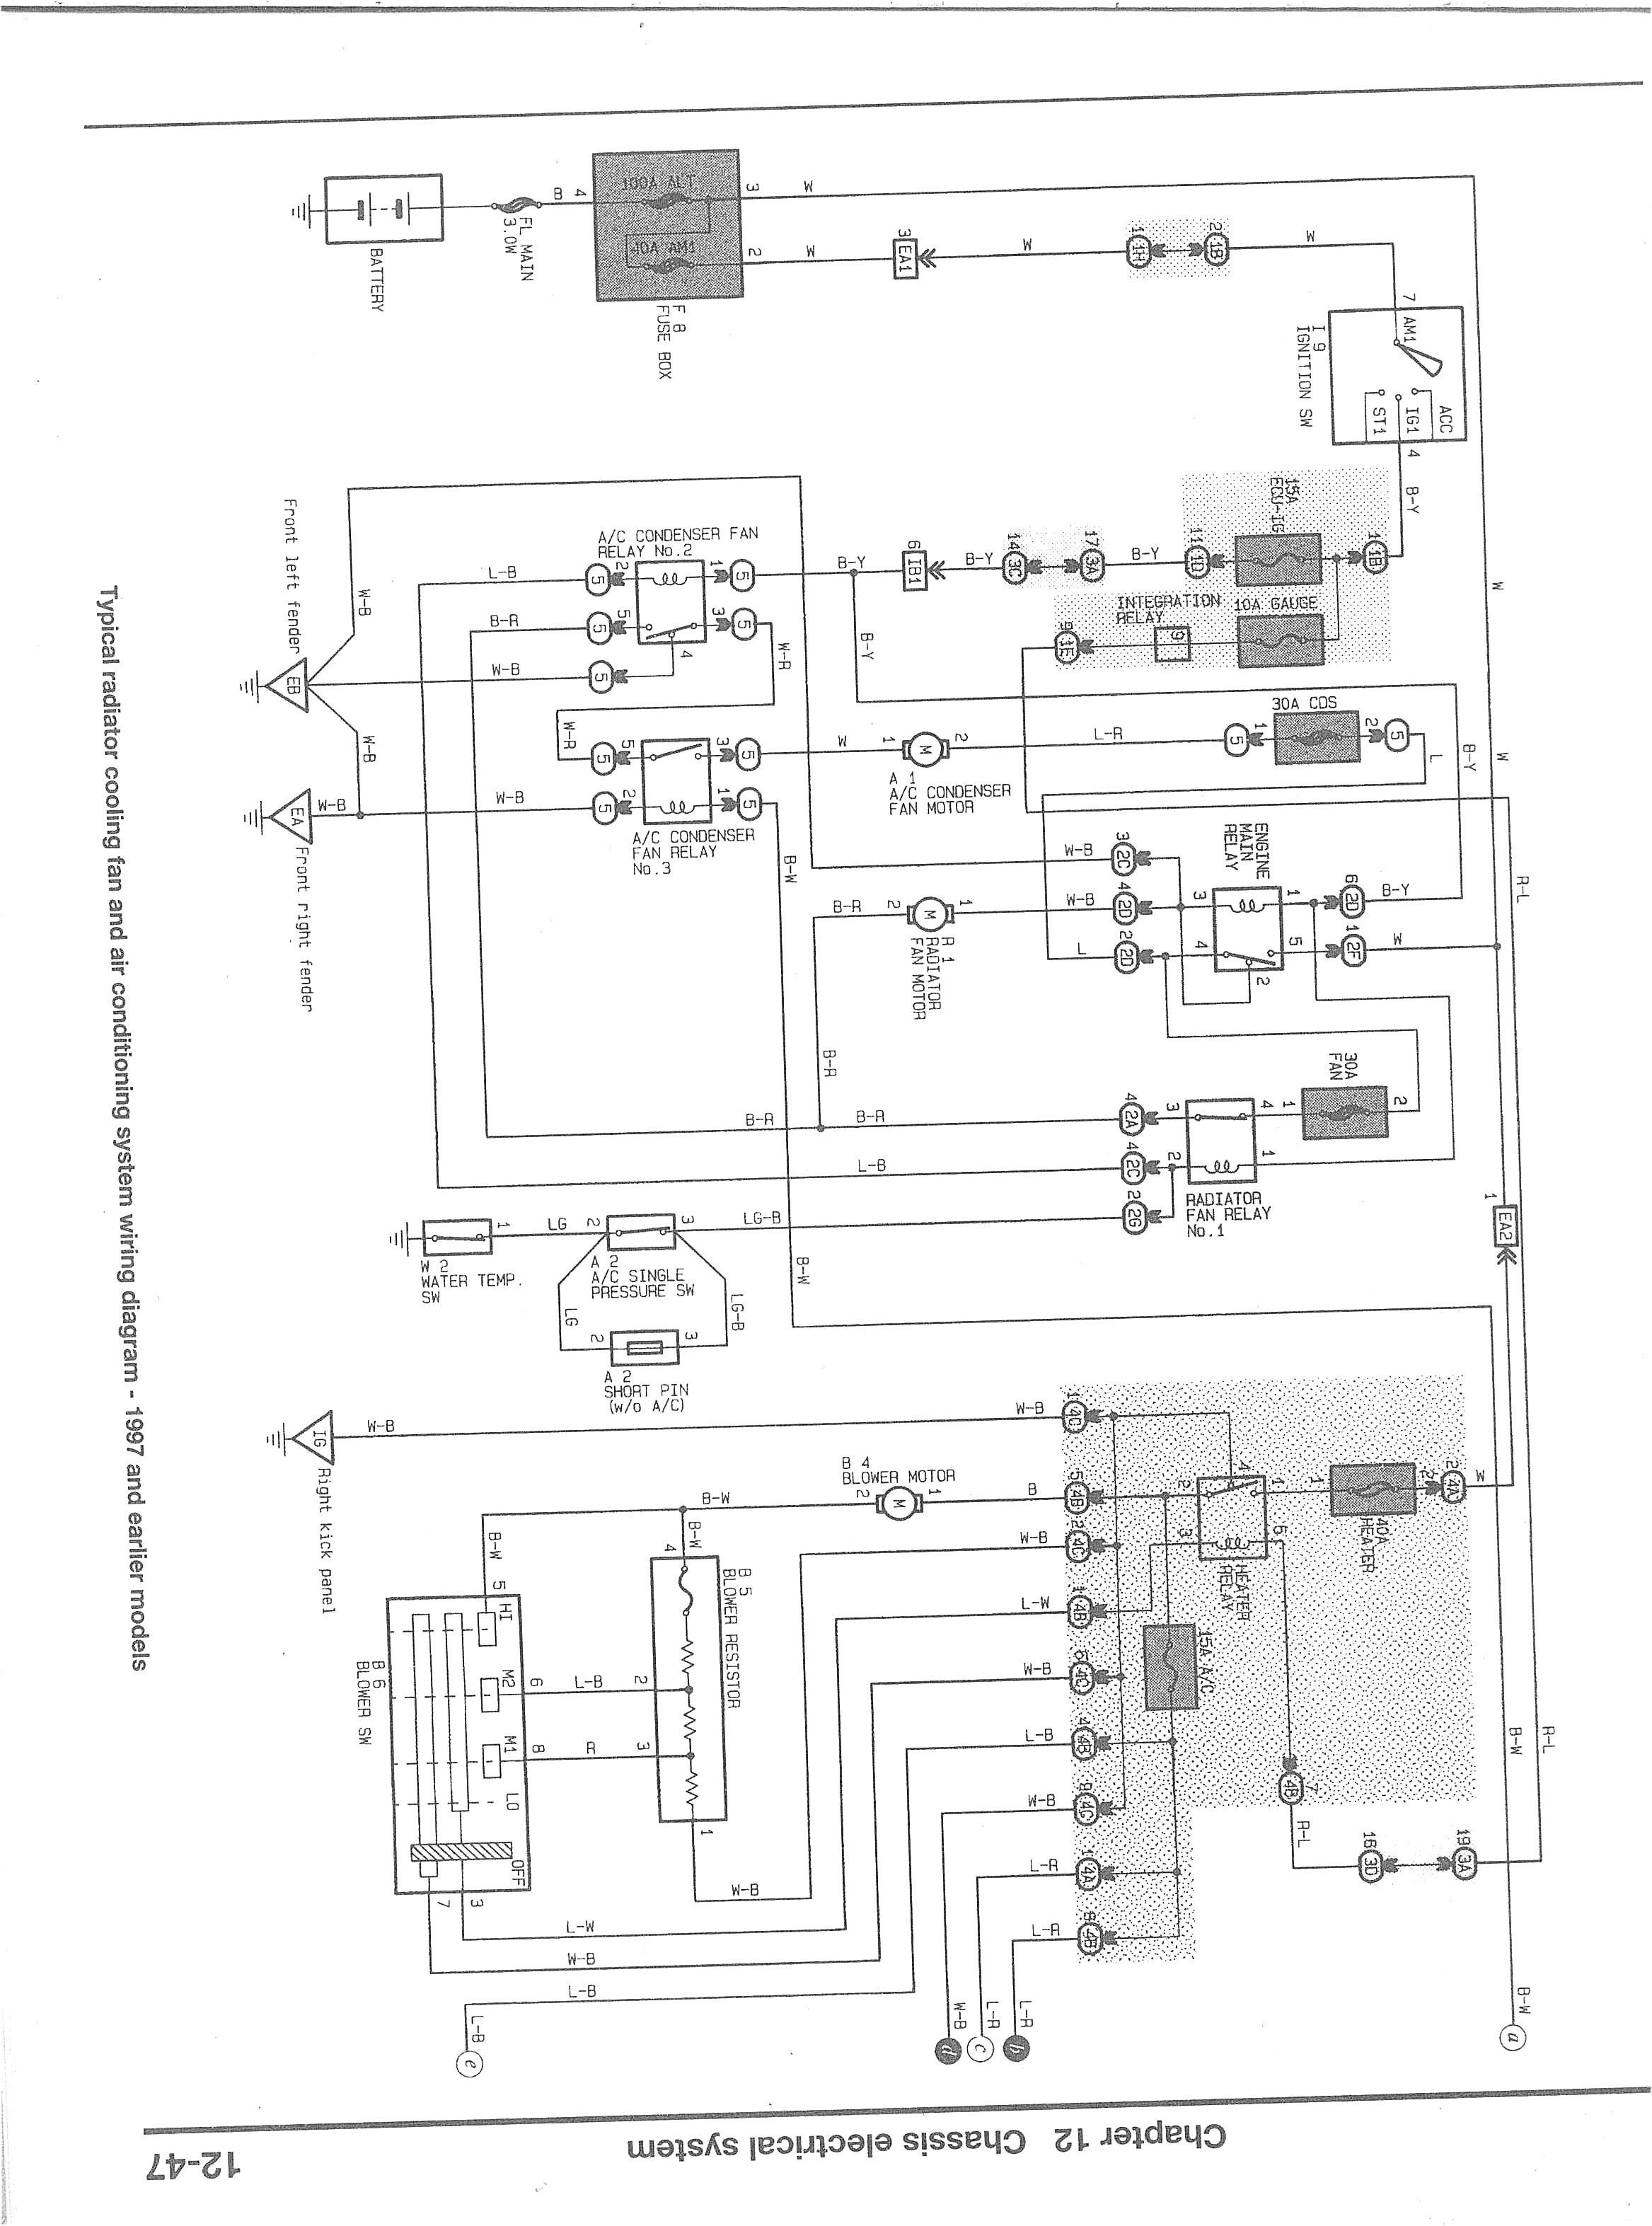 Hf 8346  Goodman Air Handler Wiring Diagrams File Name